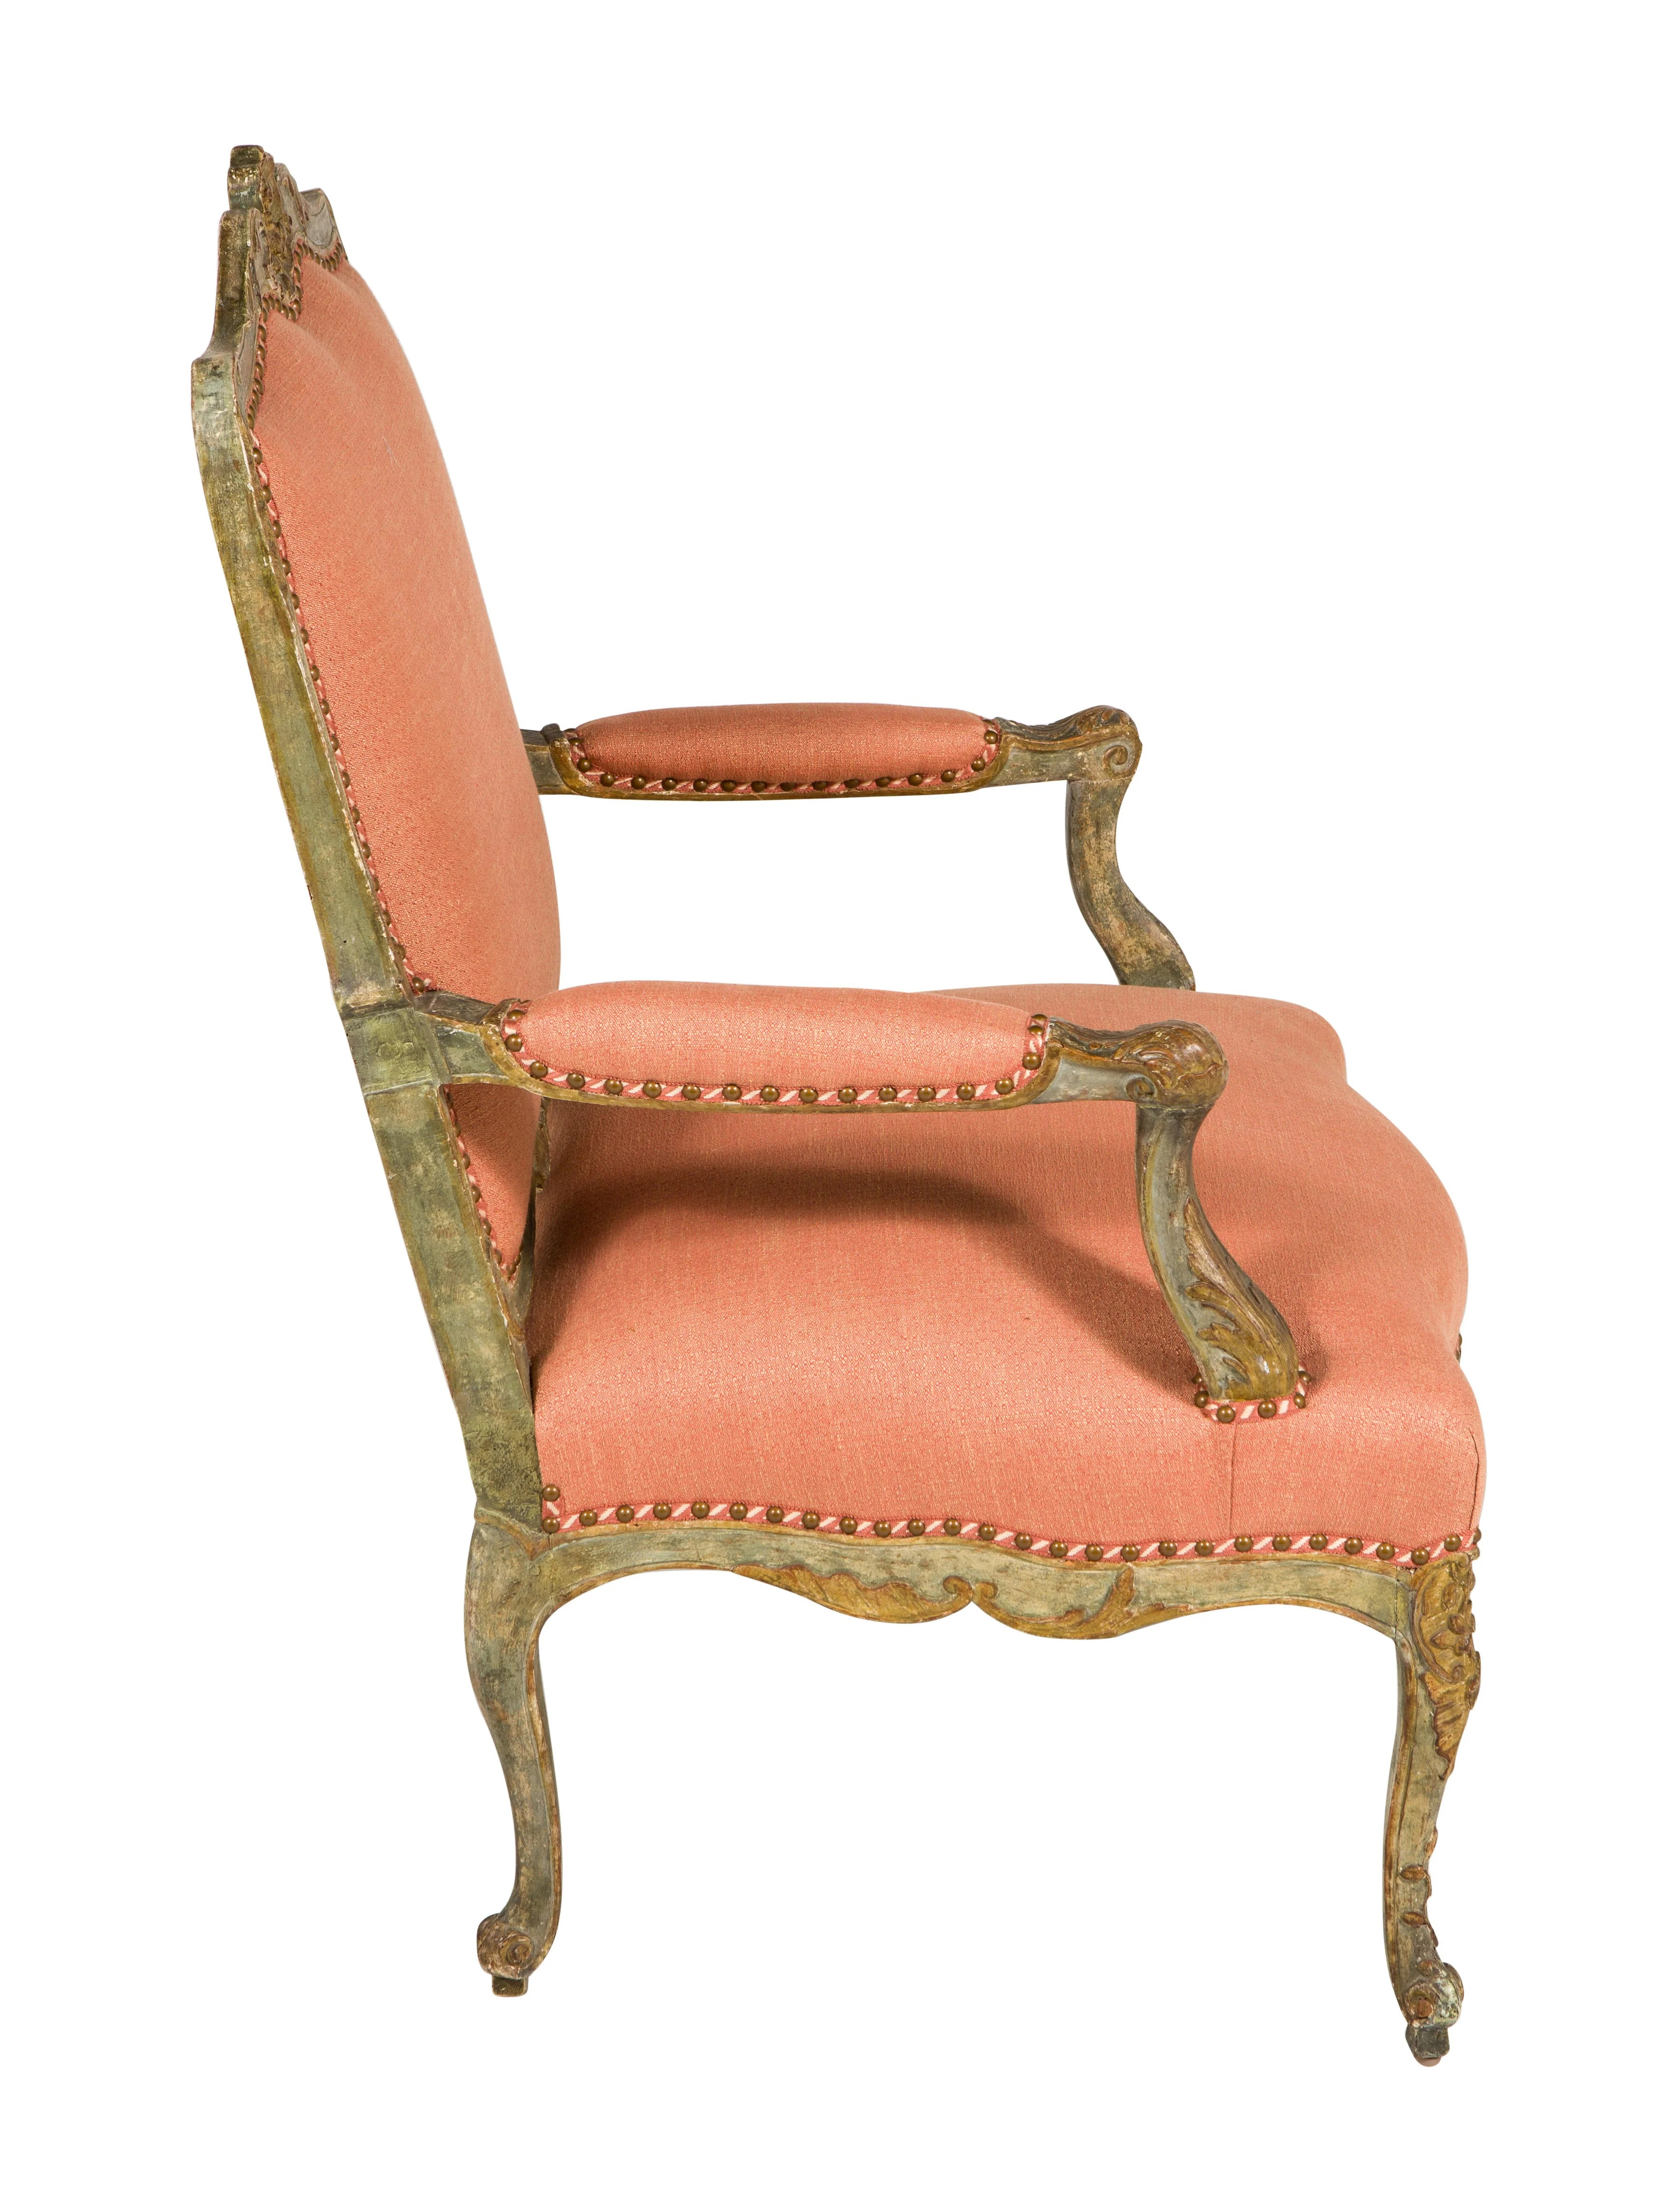 al s chairs and tables bath chair fauteuil la reine armchair furniture